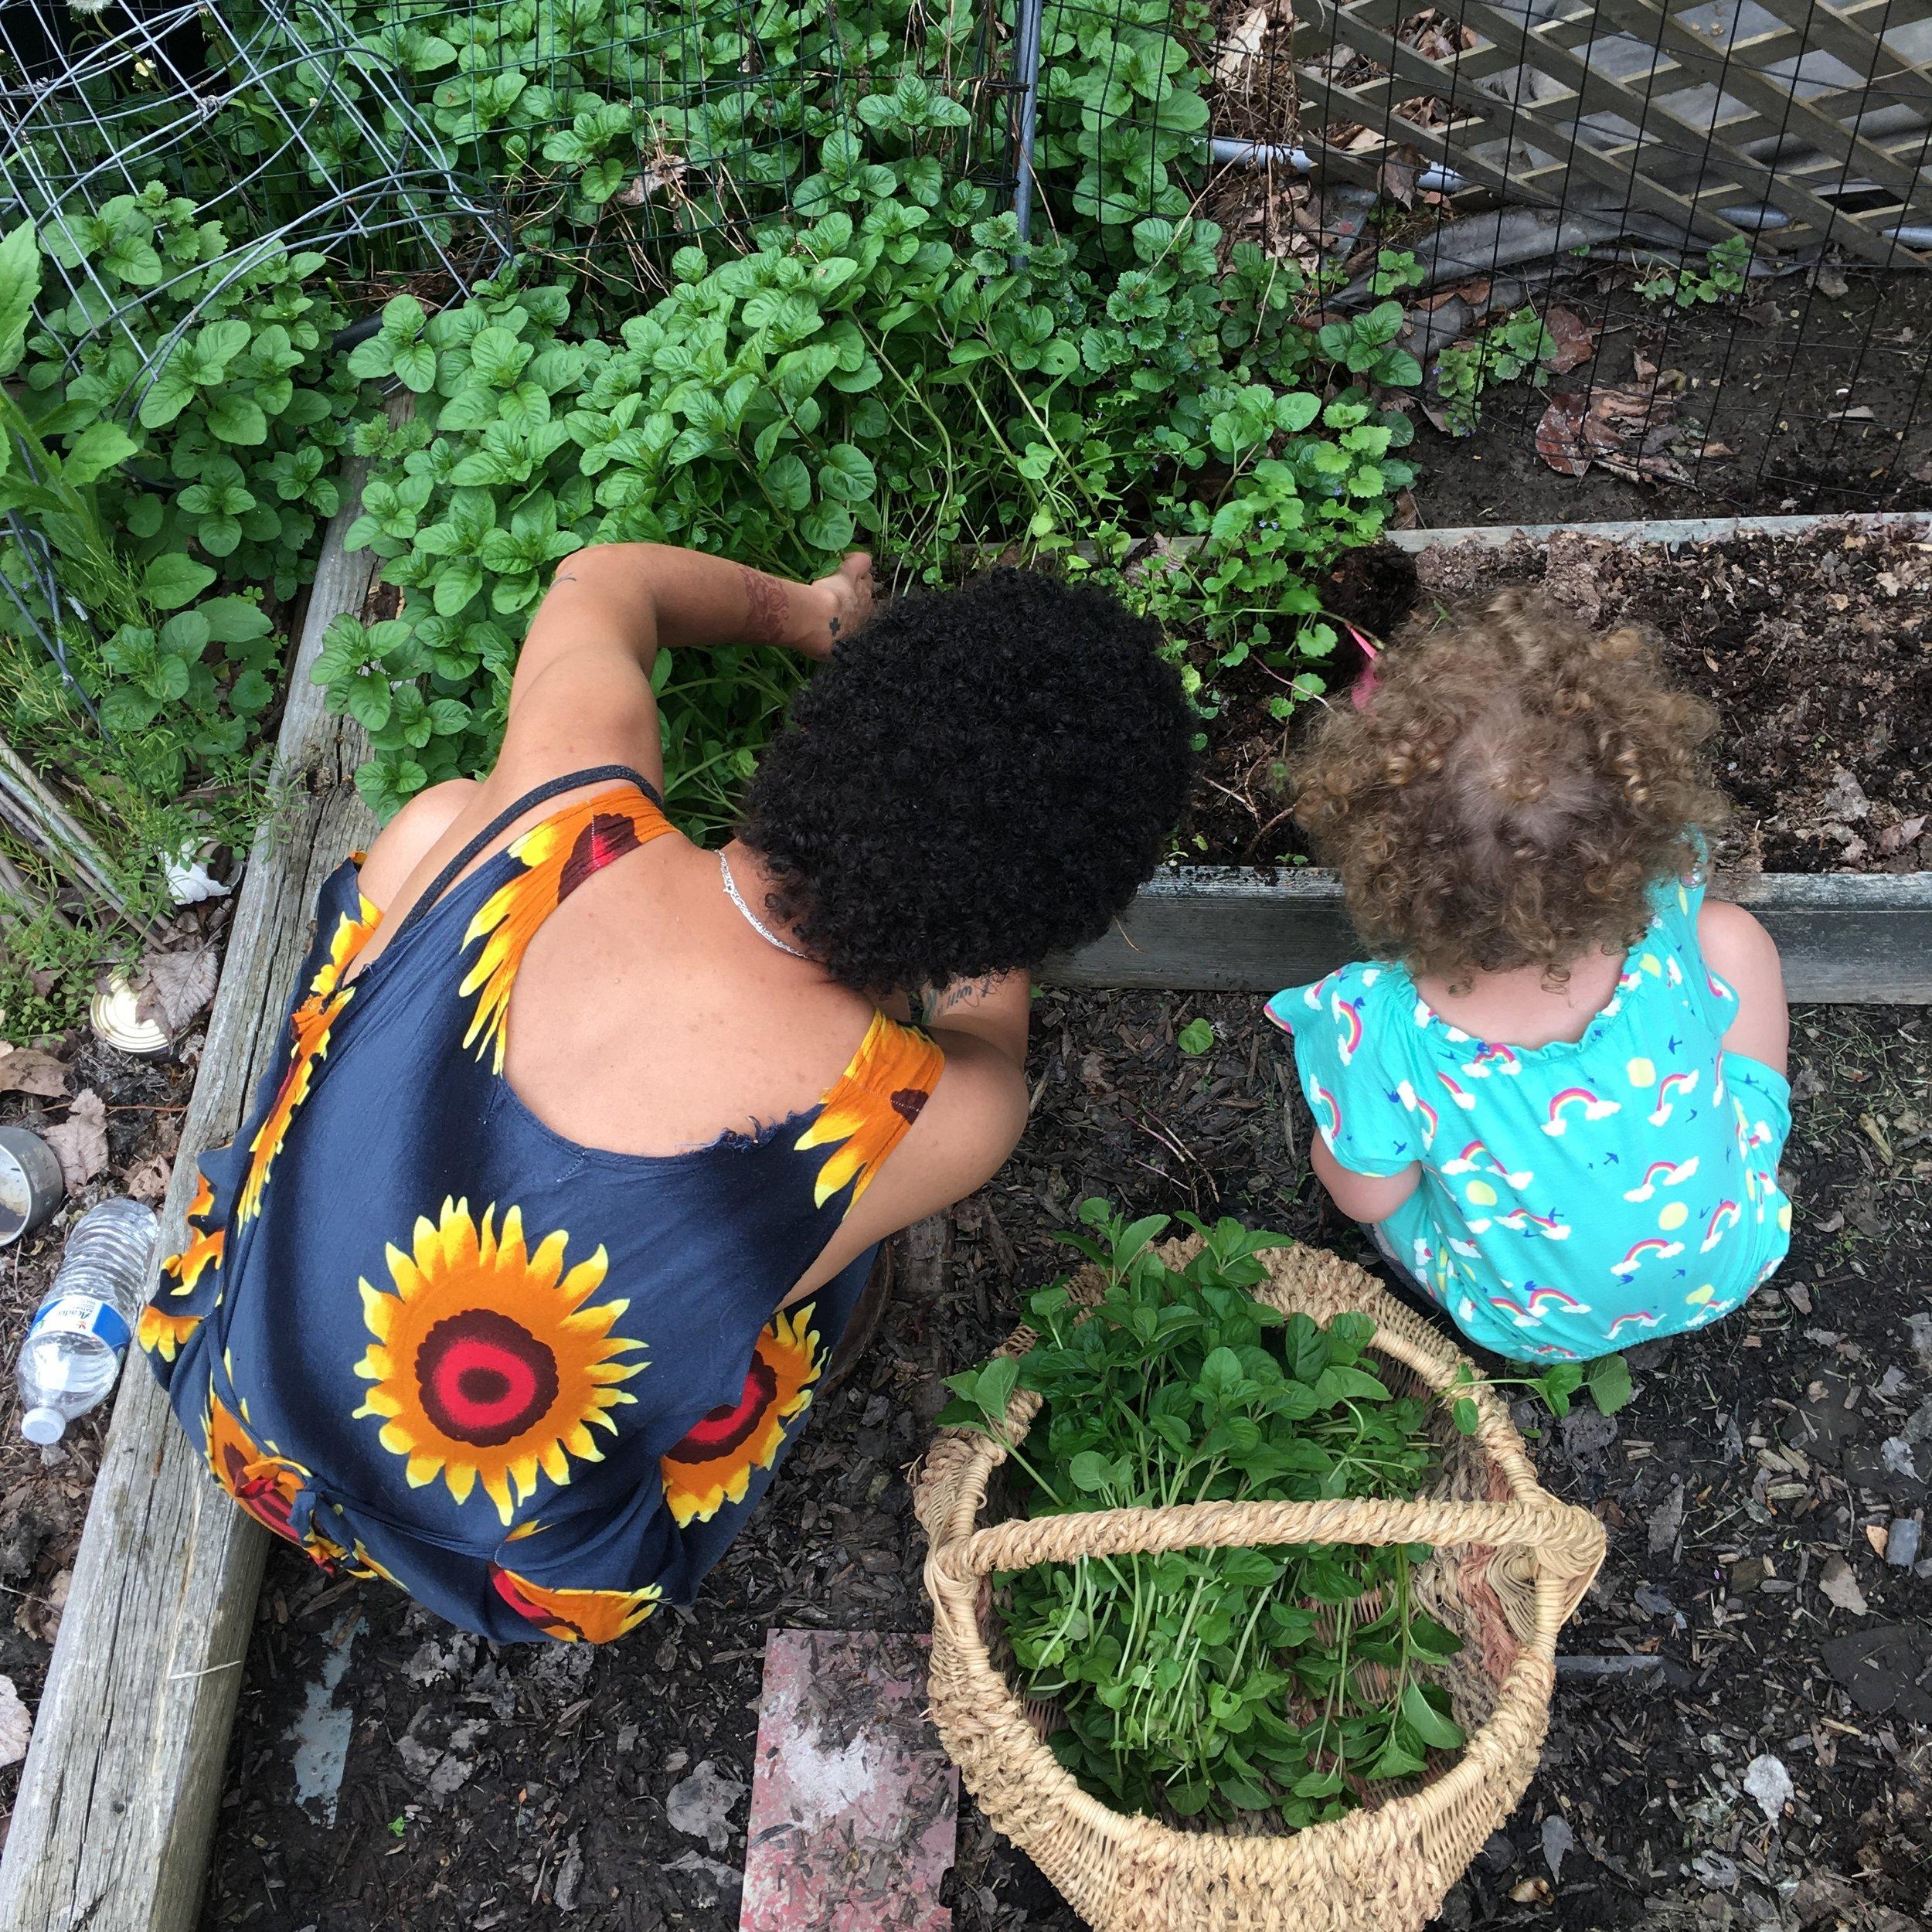 Weeding &Harvesting Chocolate Mint